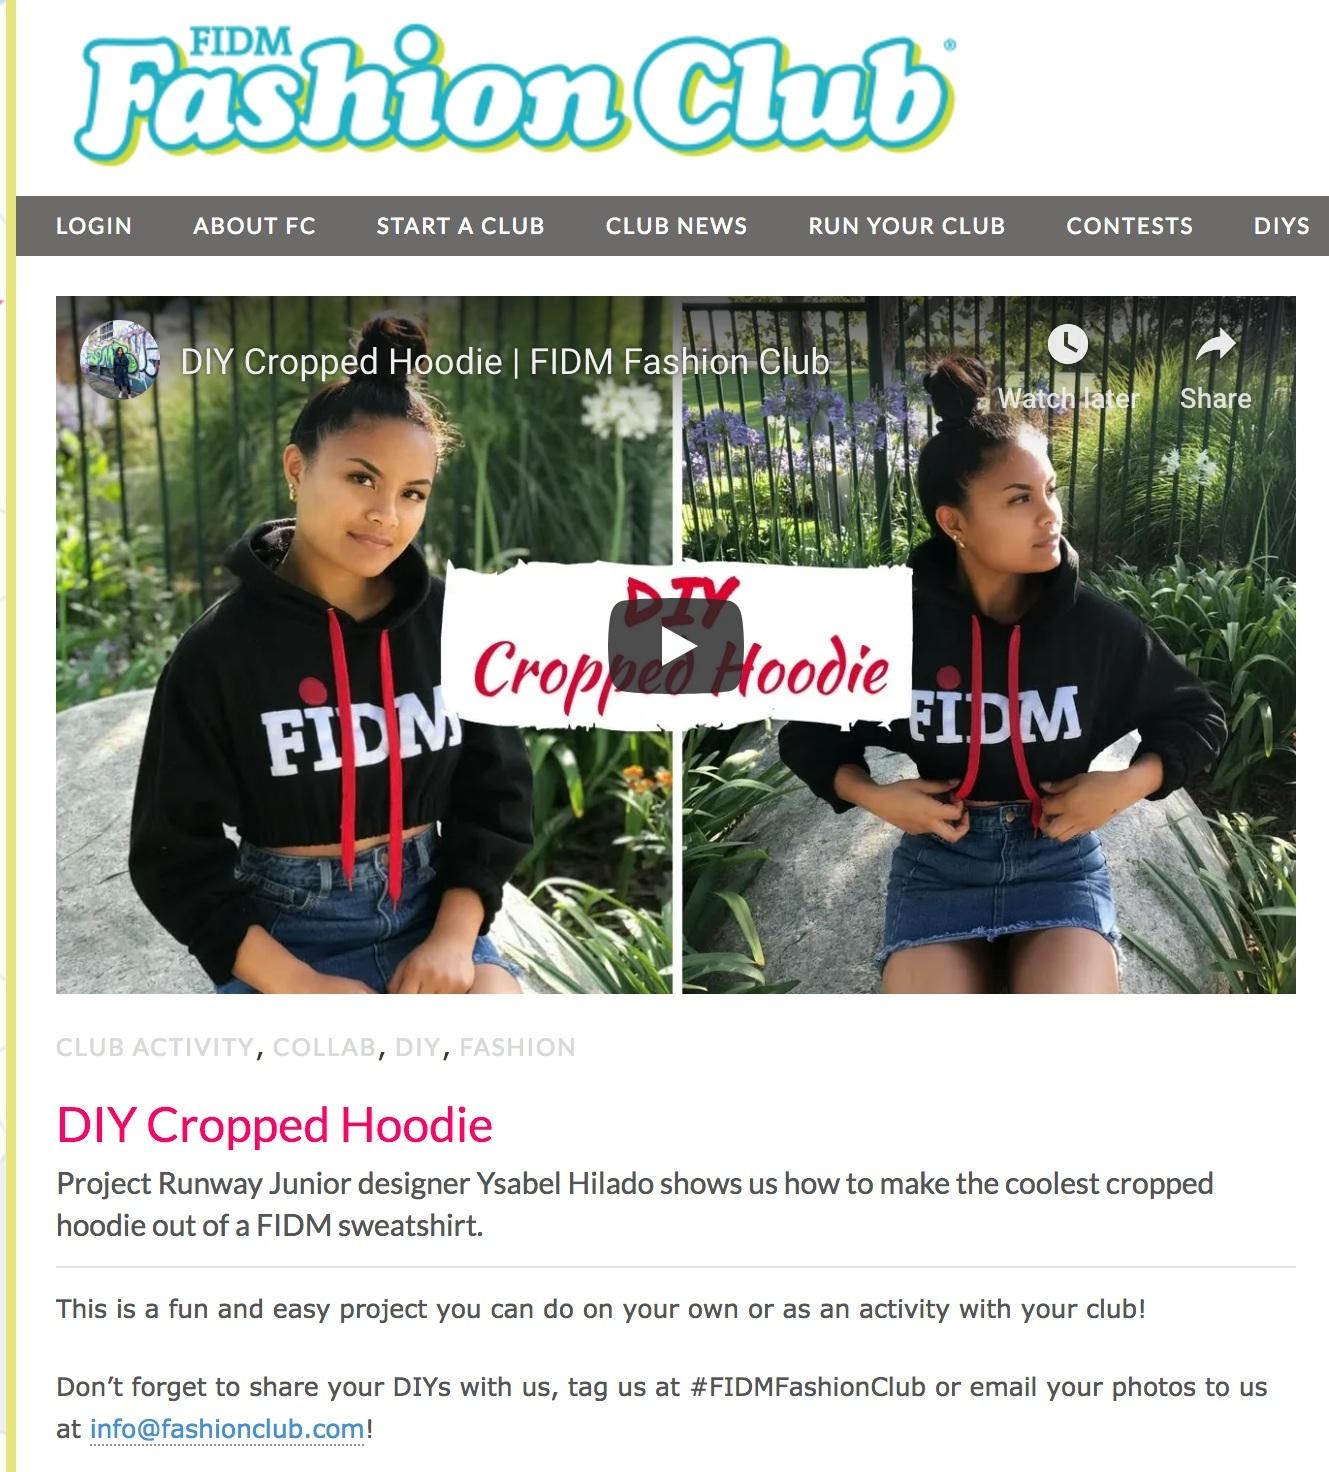 FIDM Fashion Club